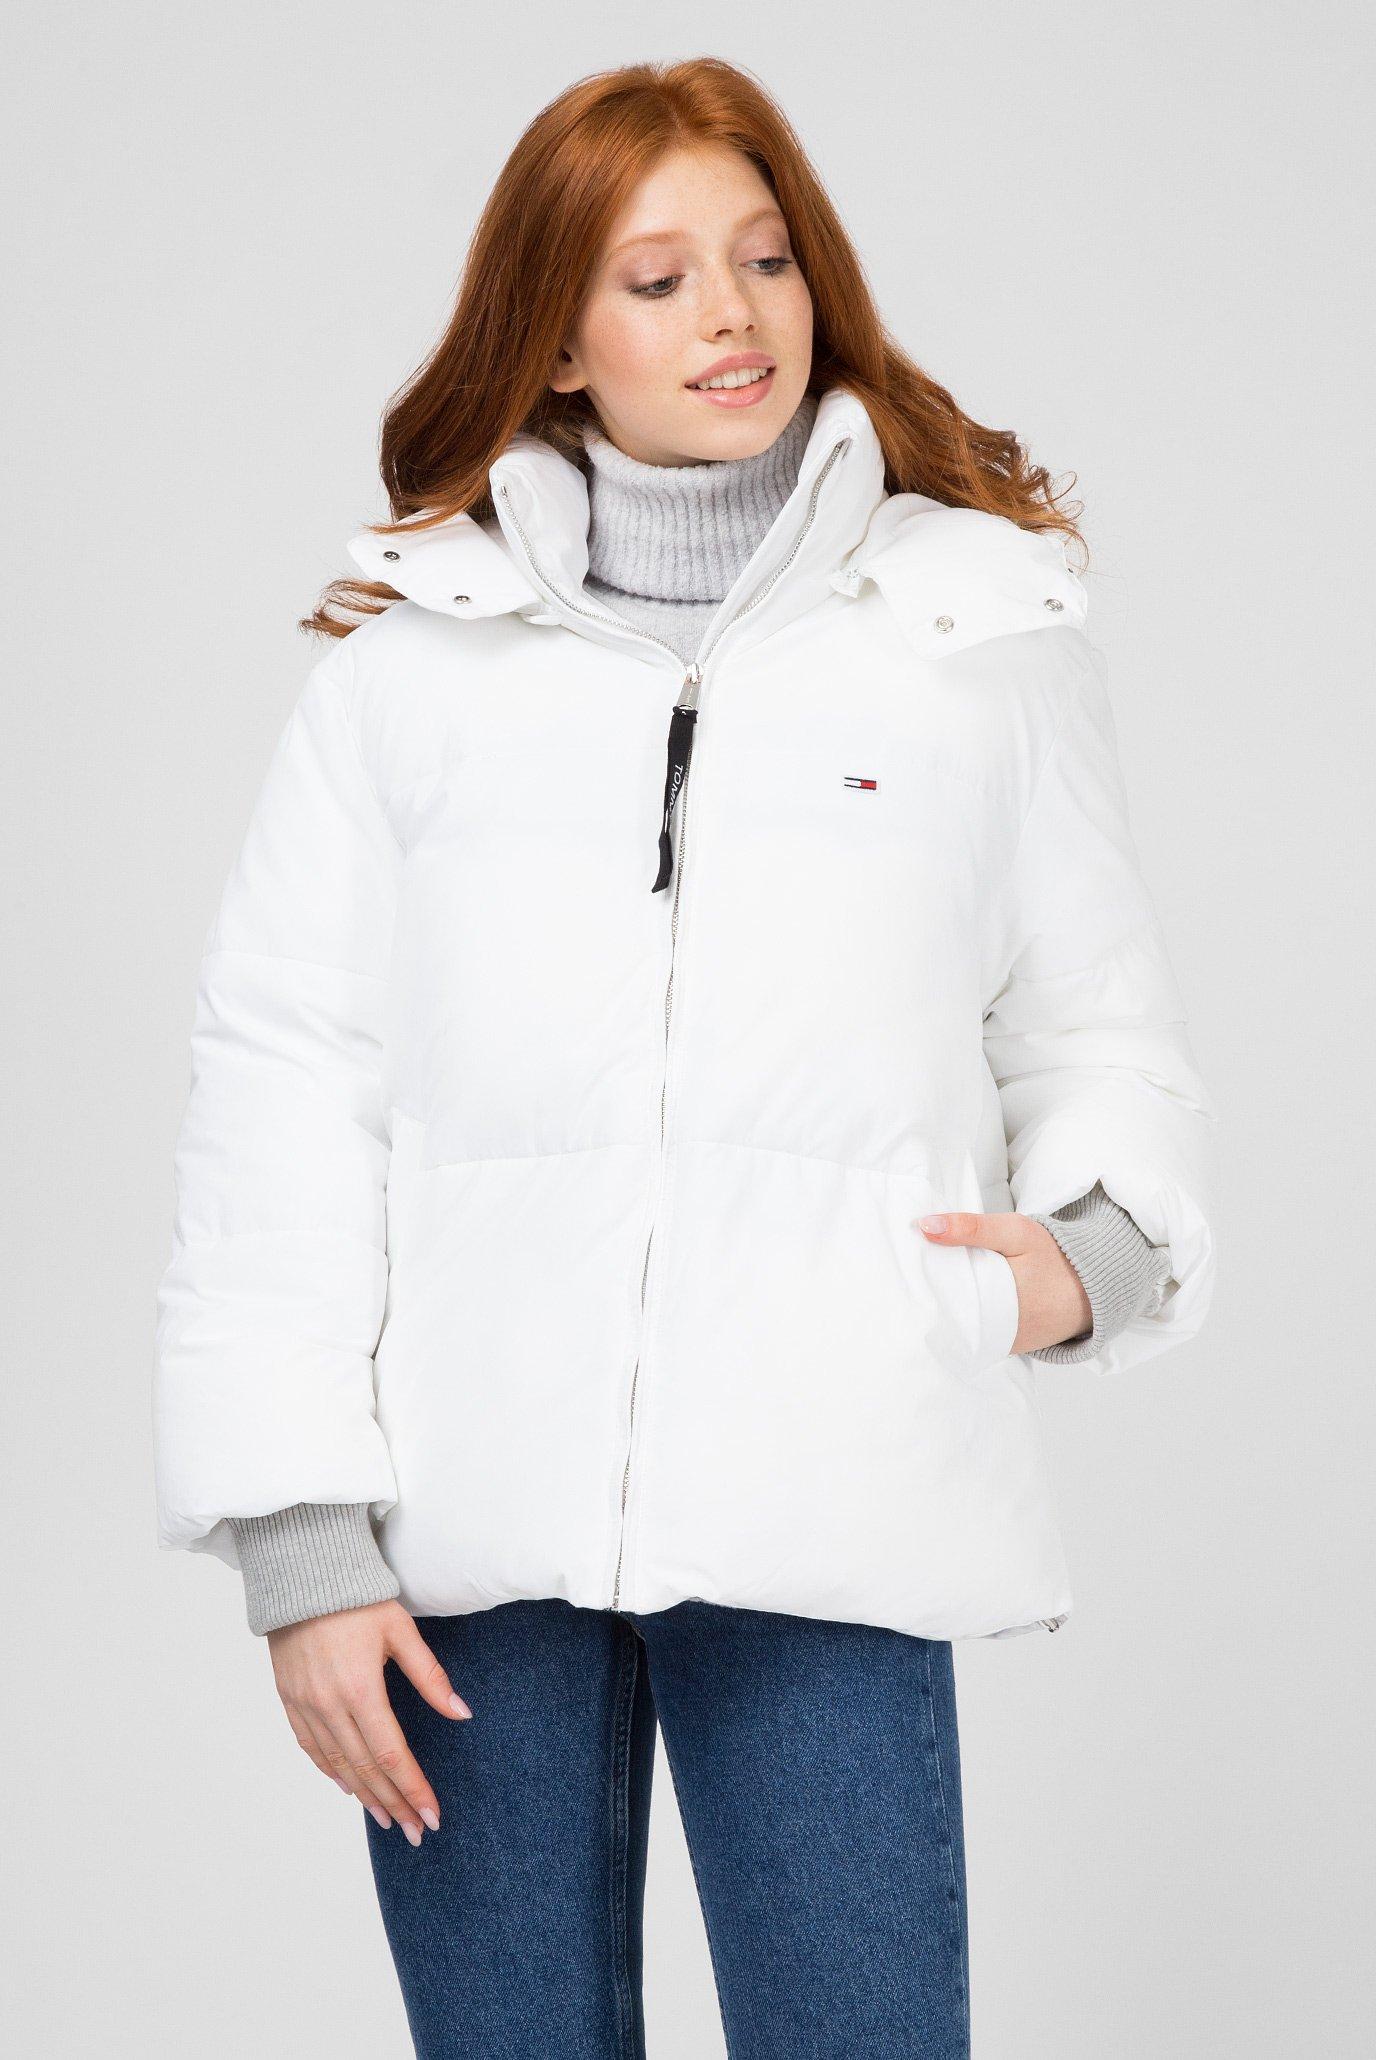 fa8fb14c125 Купить Женская белая куртка Tommy Hilfiger Tommy Hilfiger DW0DW05183 –  Киев